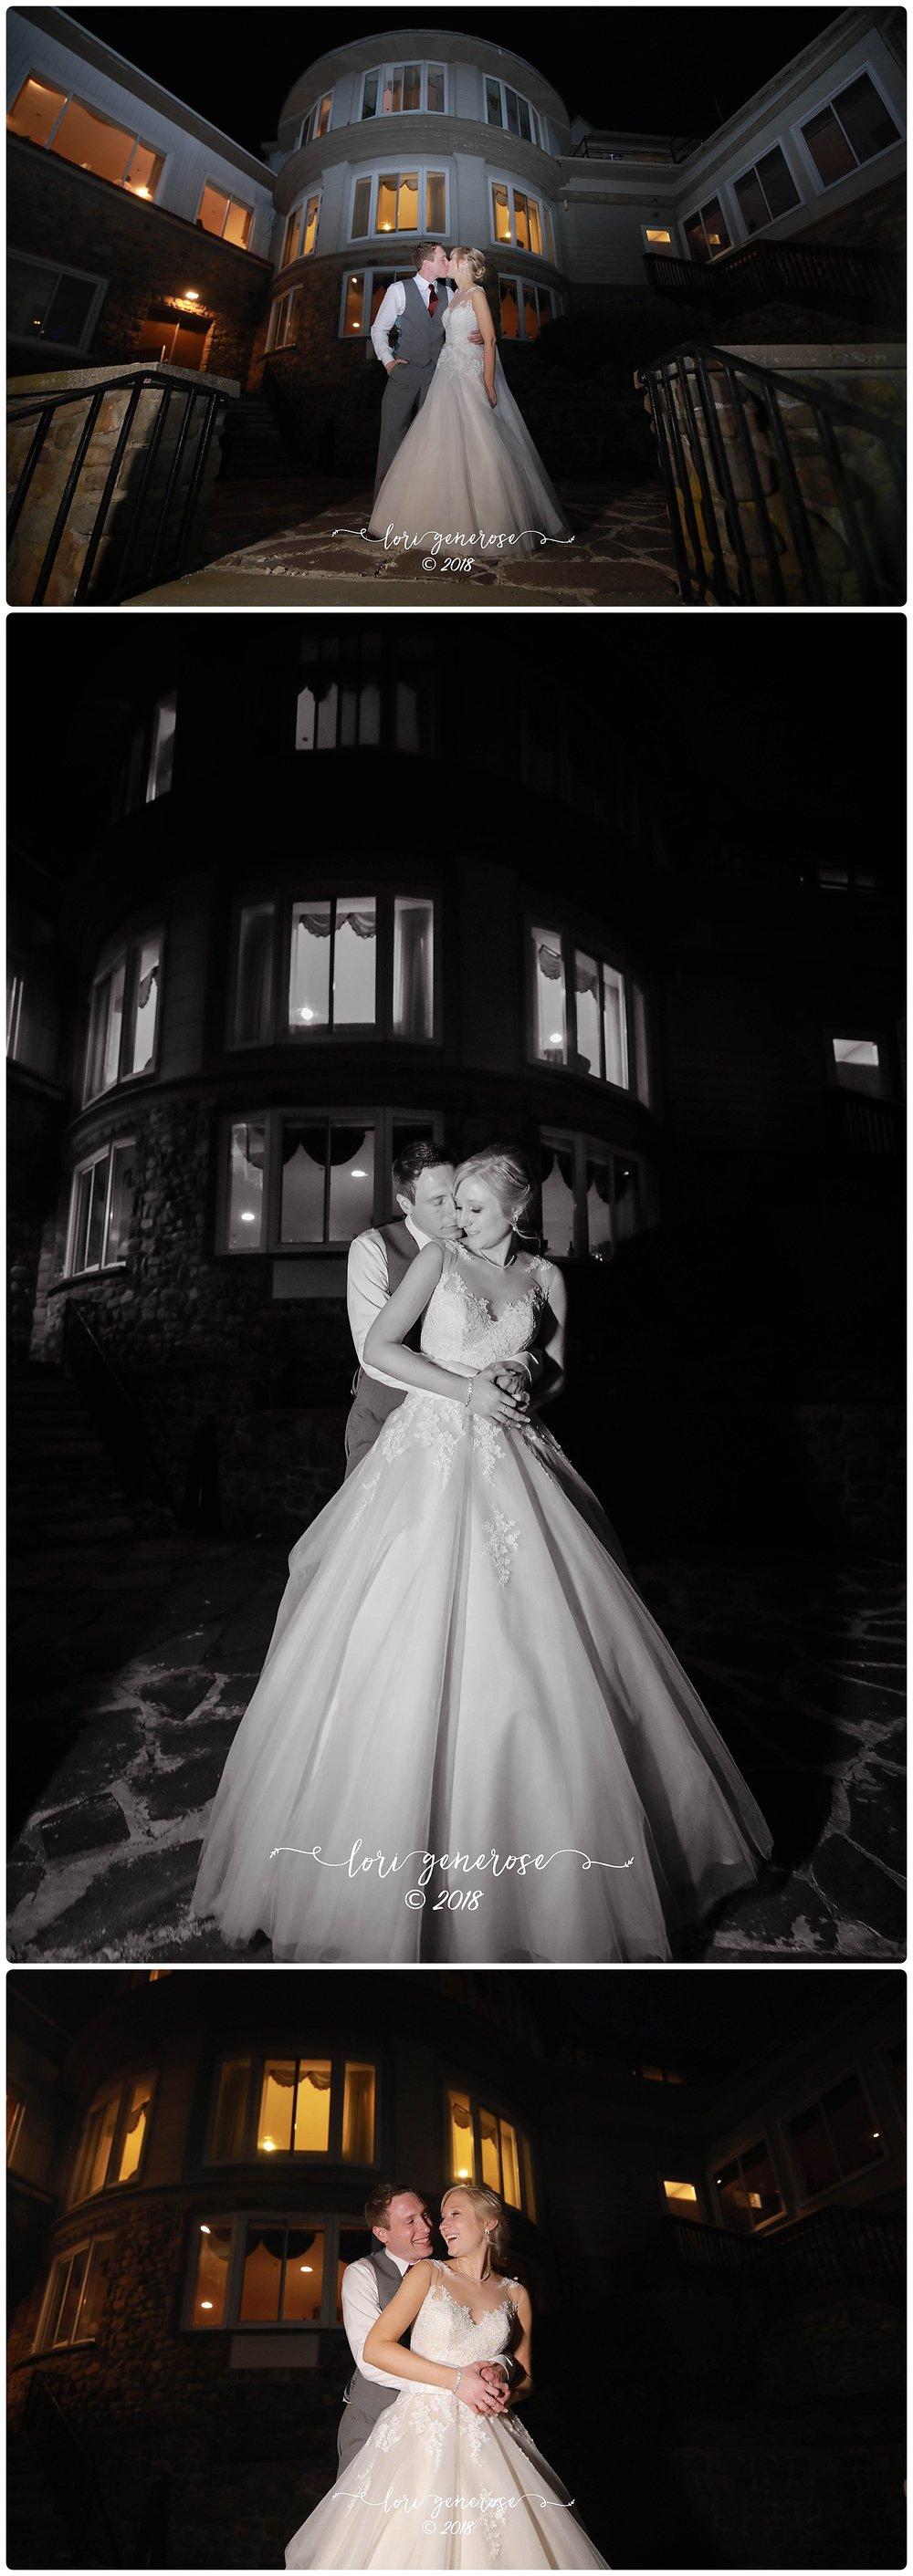 lgphotographylorigenerosetheinnatpoconomanorpaweddingvenuebridegroomnighttimeweddingshots.jpg